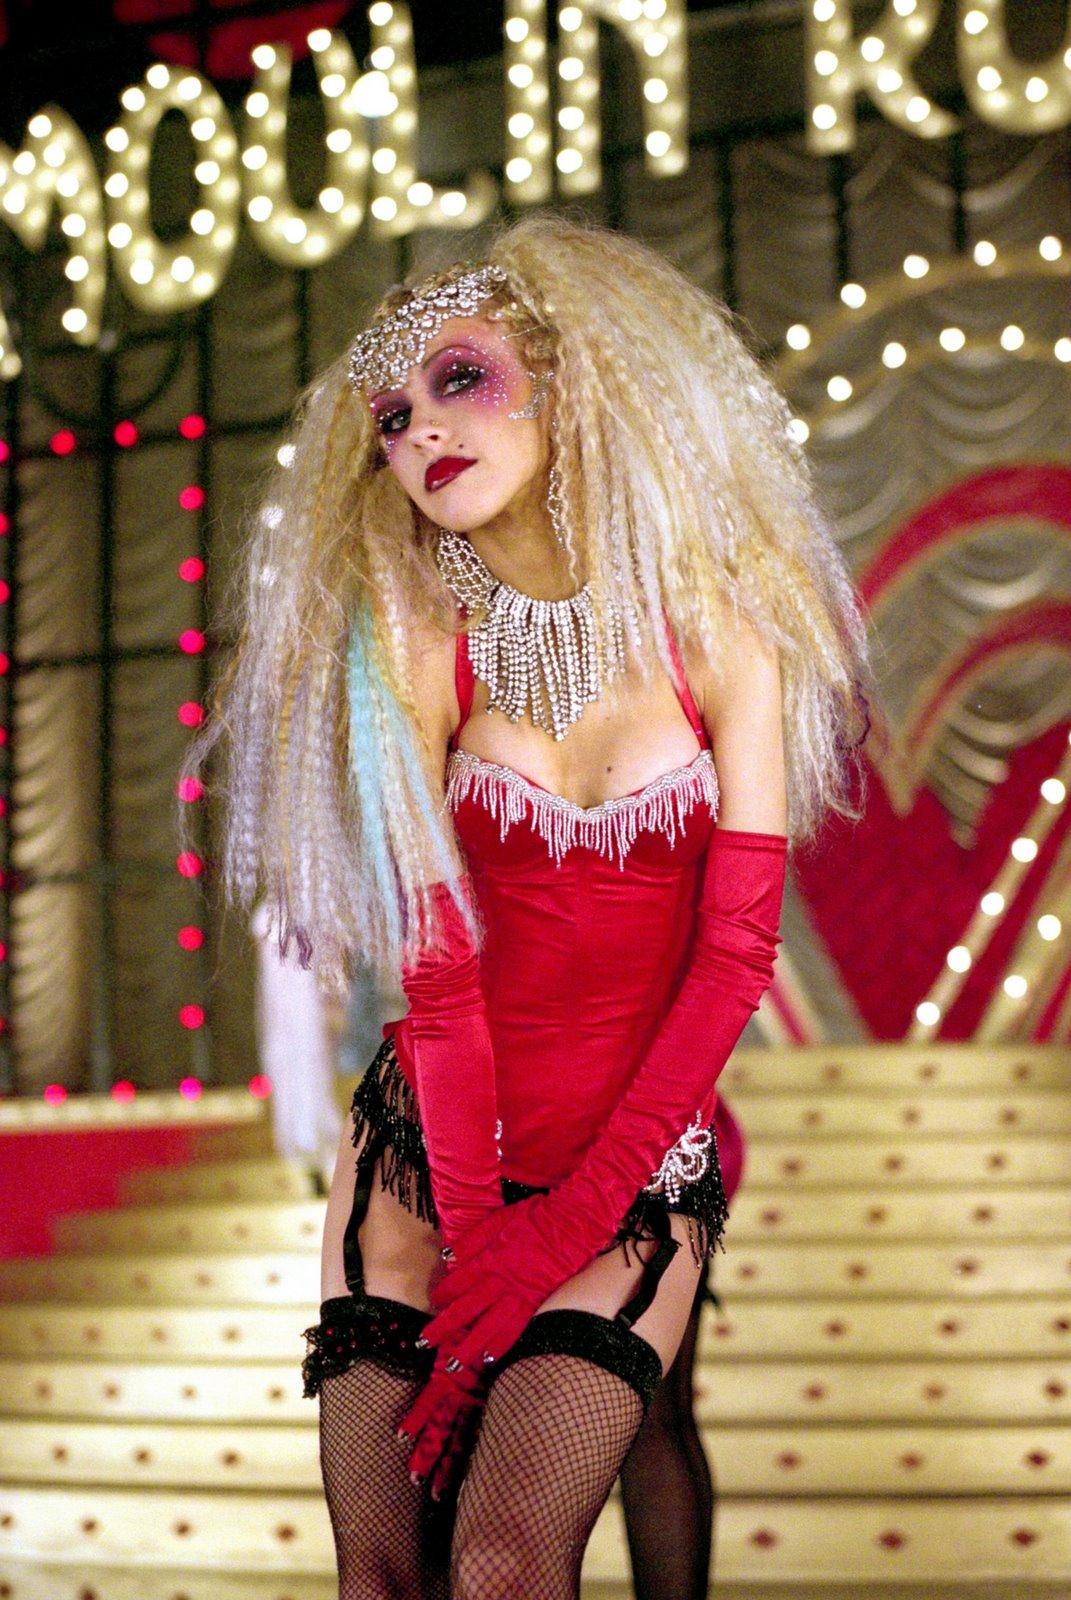 Aguilera kim mya pink lady marmalade porn music remix - 2 part 4